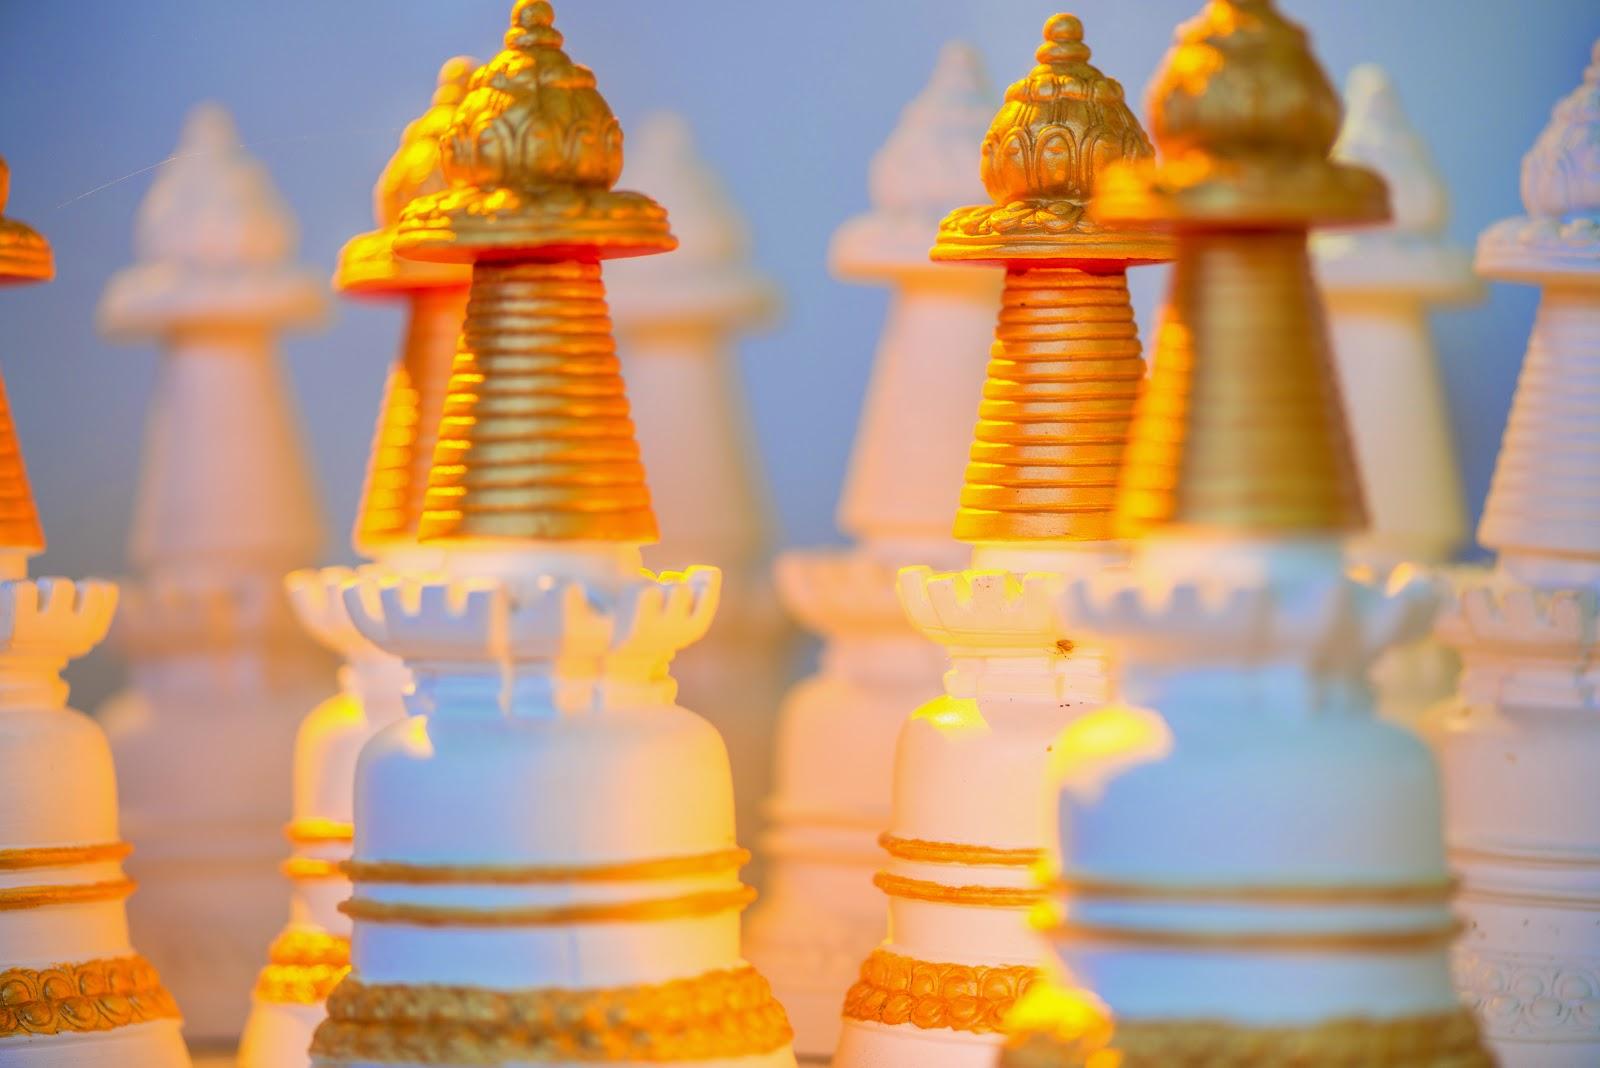 Beautiful stupas at Kachoe Dechen Ling. Photo by Chris Majors.